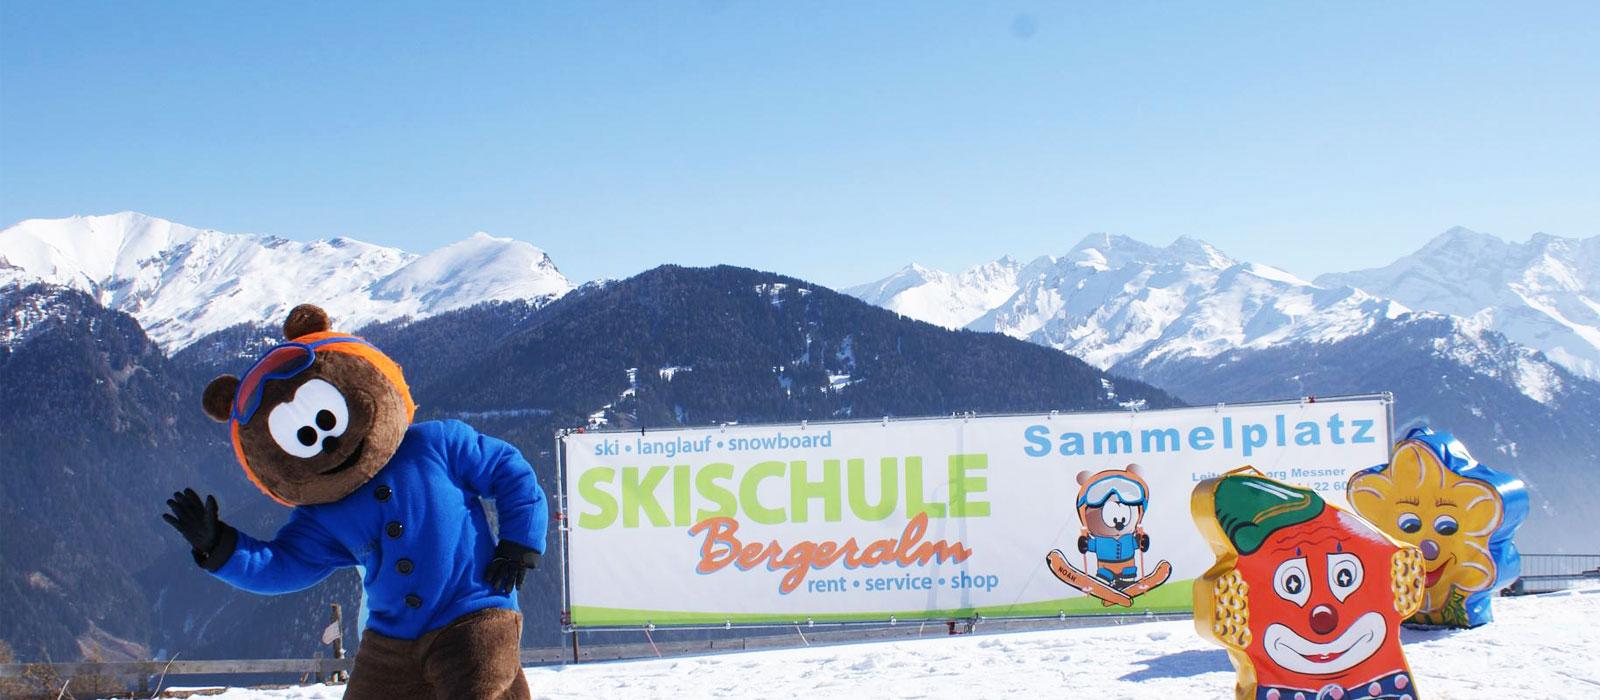 skischule-bergeralm3